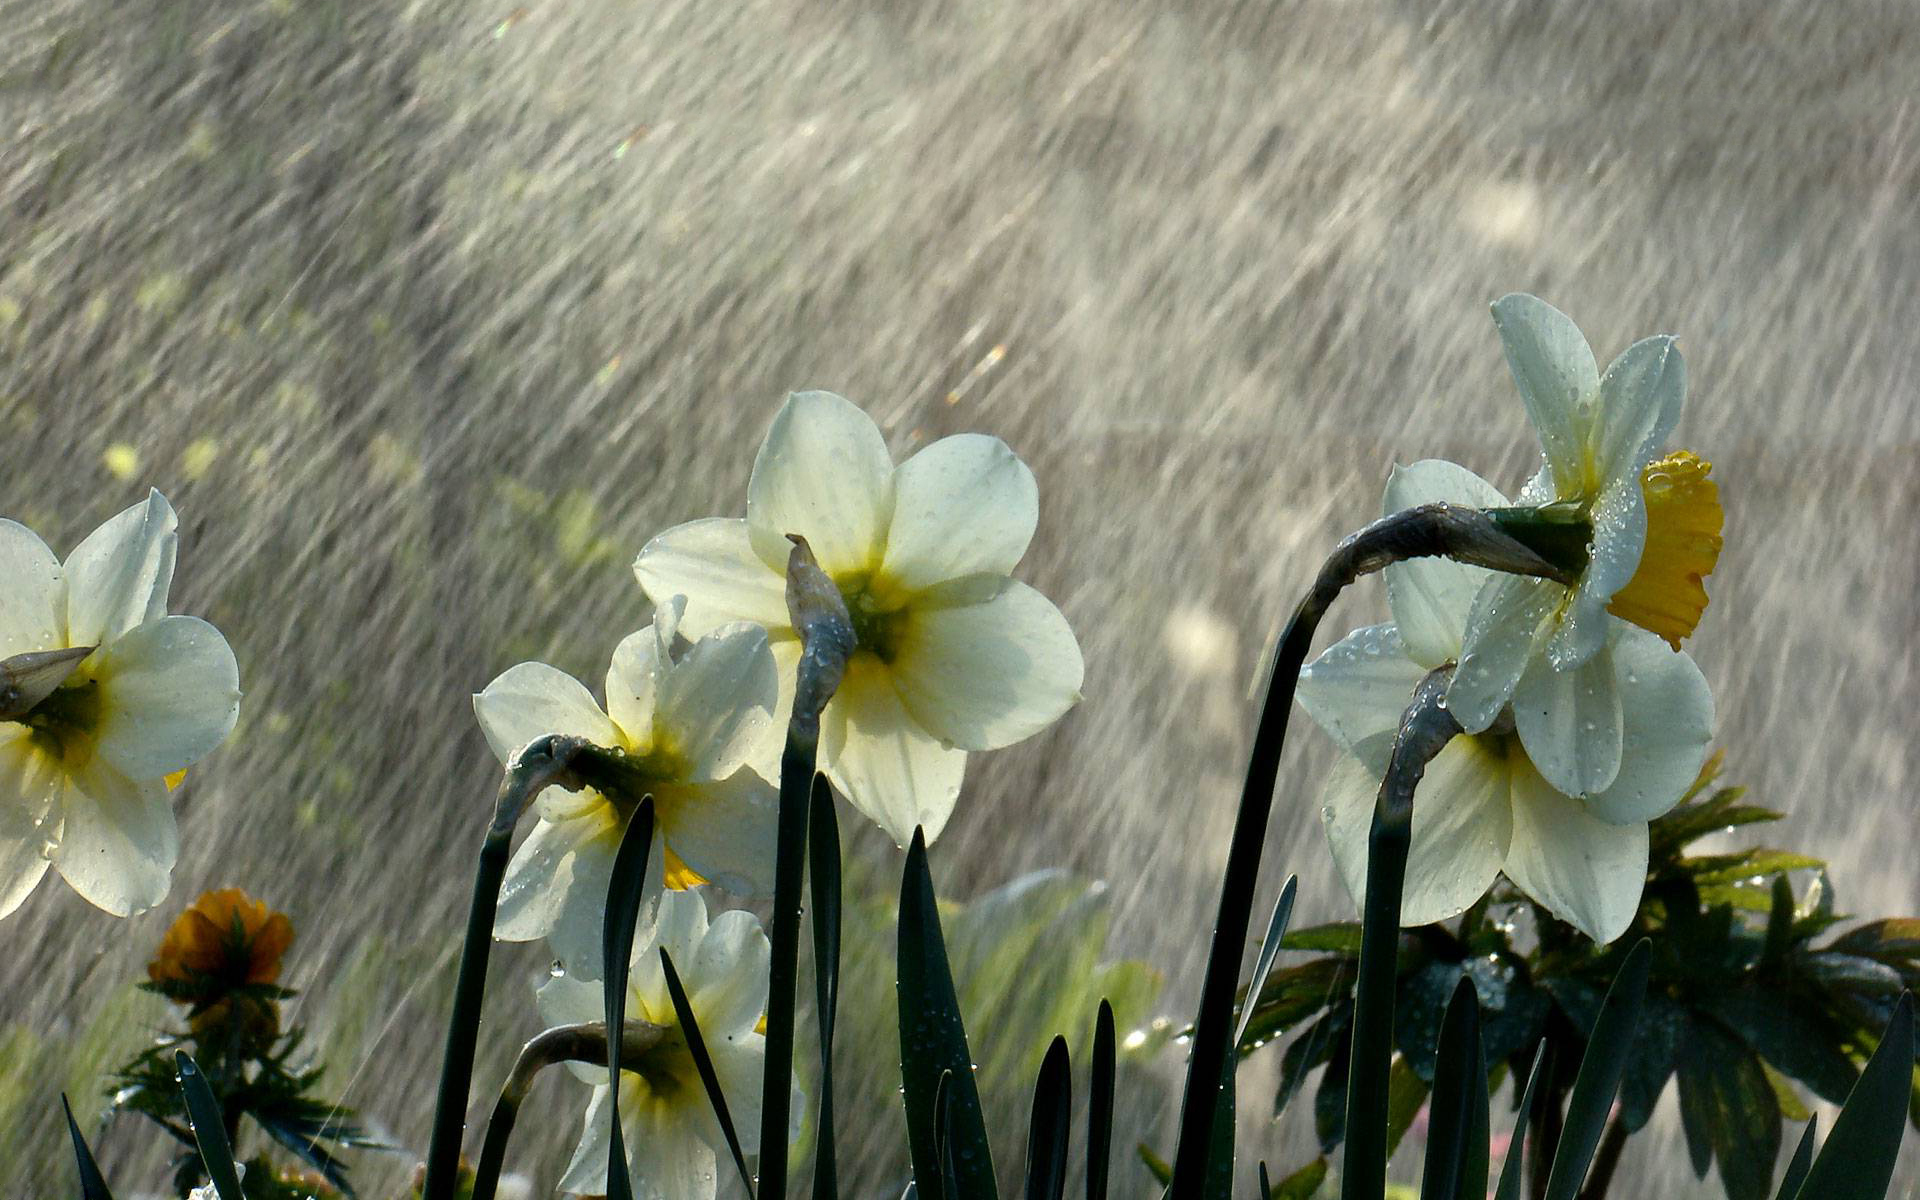 Daffodils rain